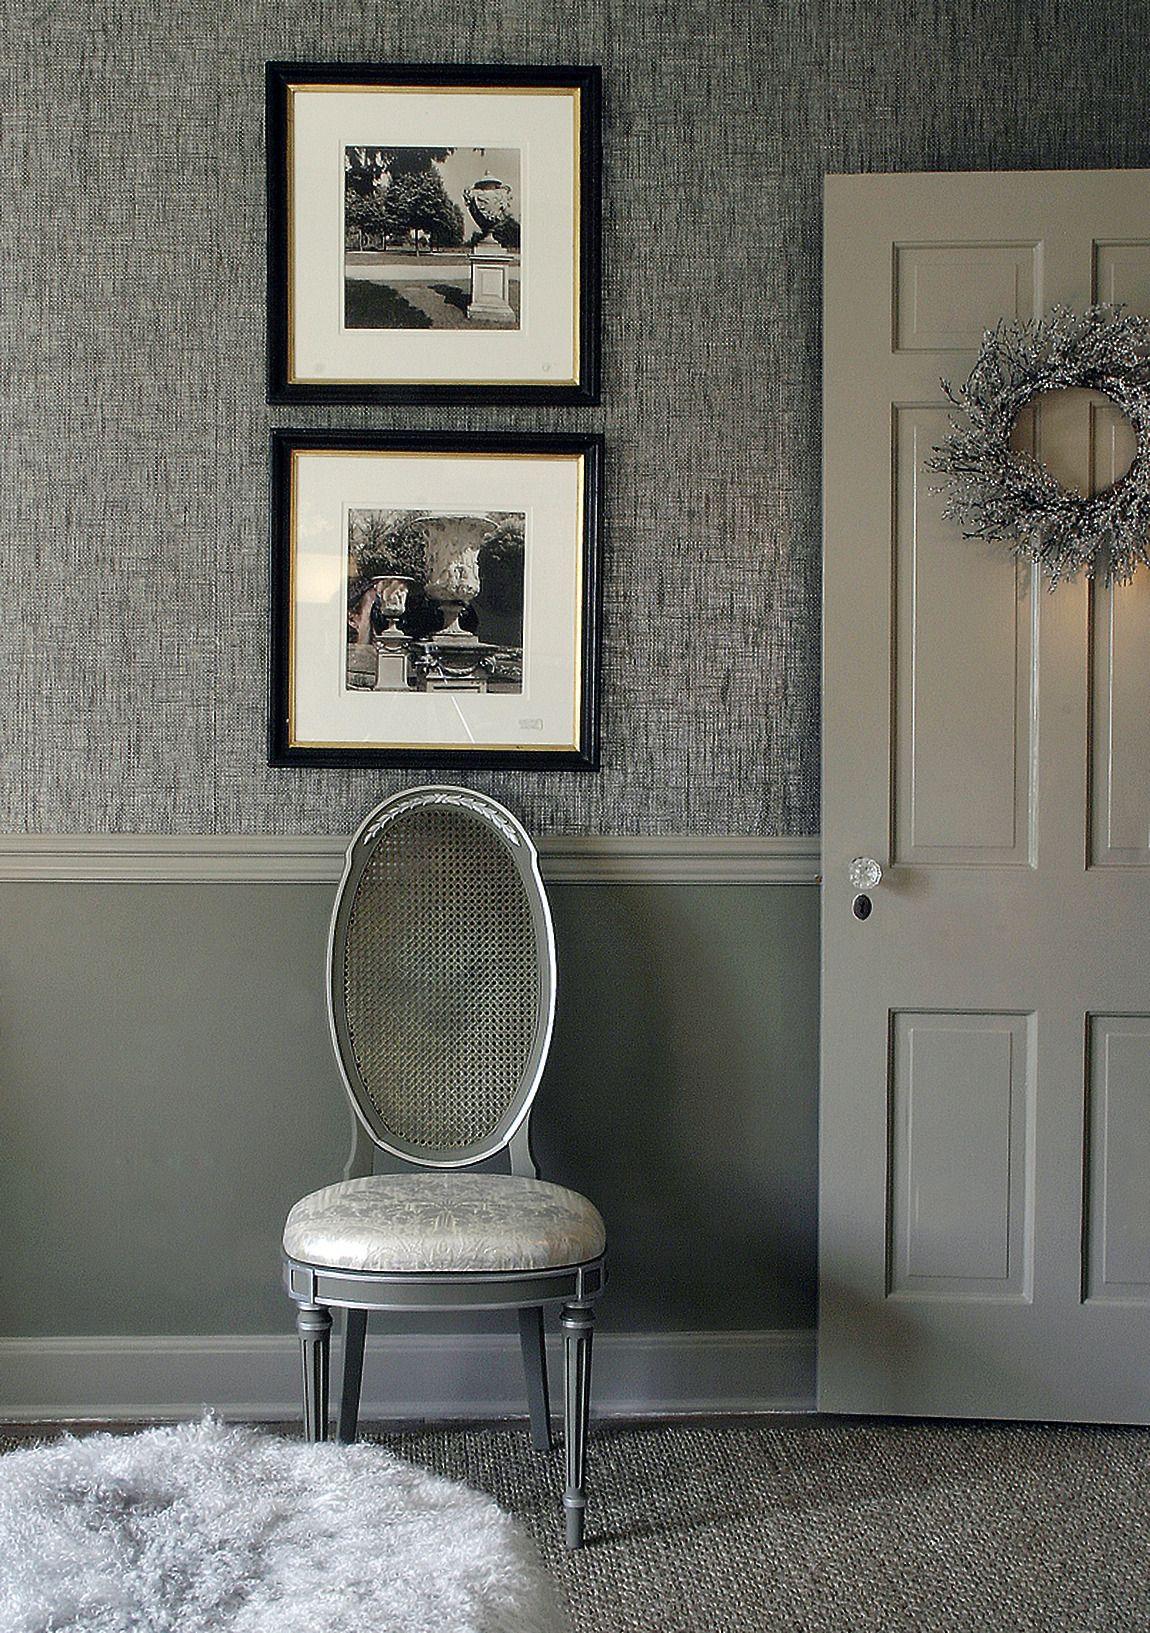 Marvelous Chair Rail Wallpaper Part - 4: Painted Under Chair Rail, Wallpaper